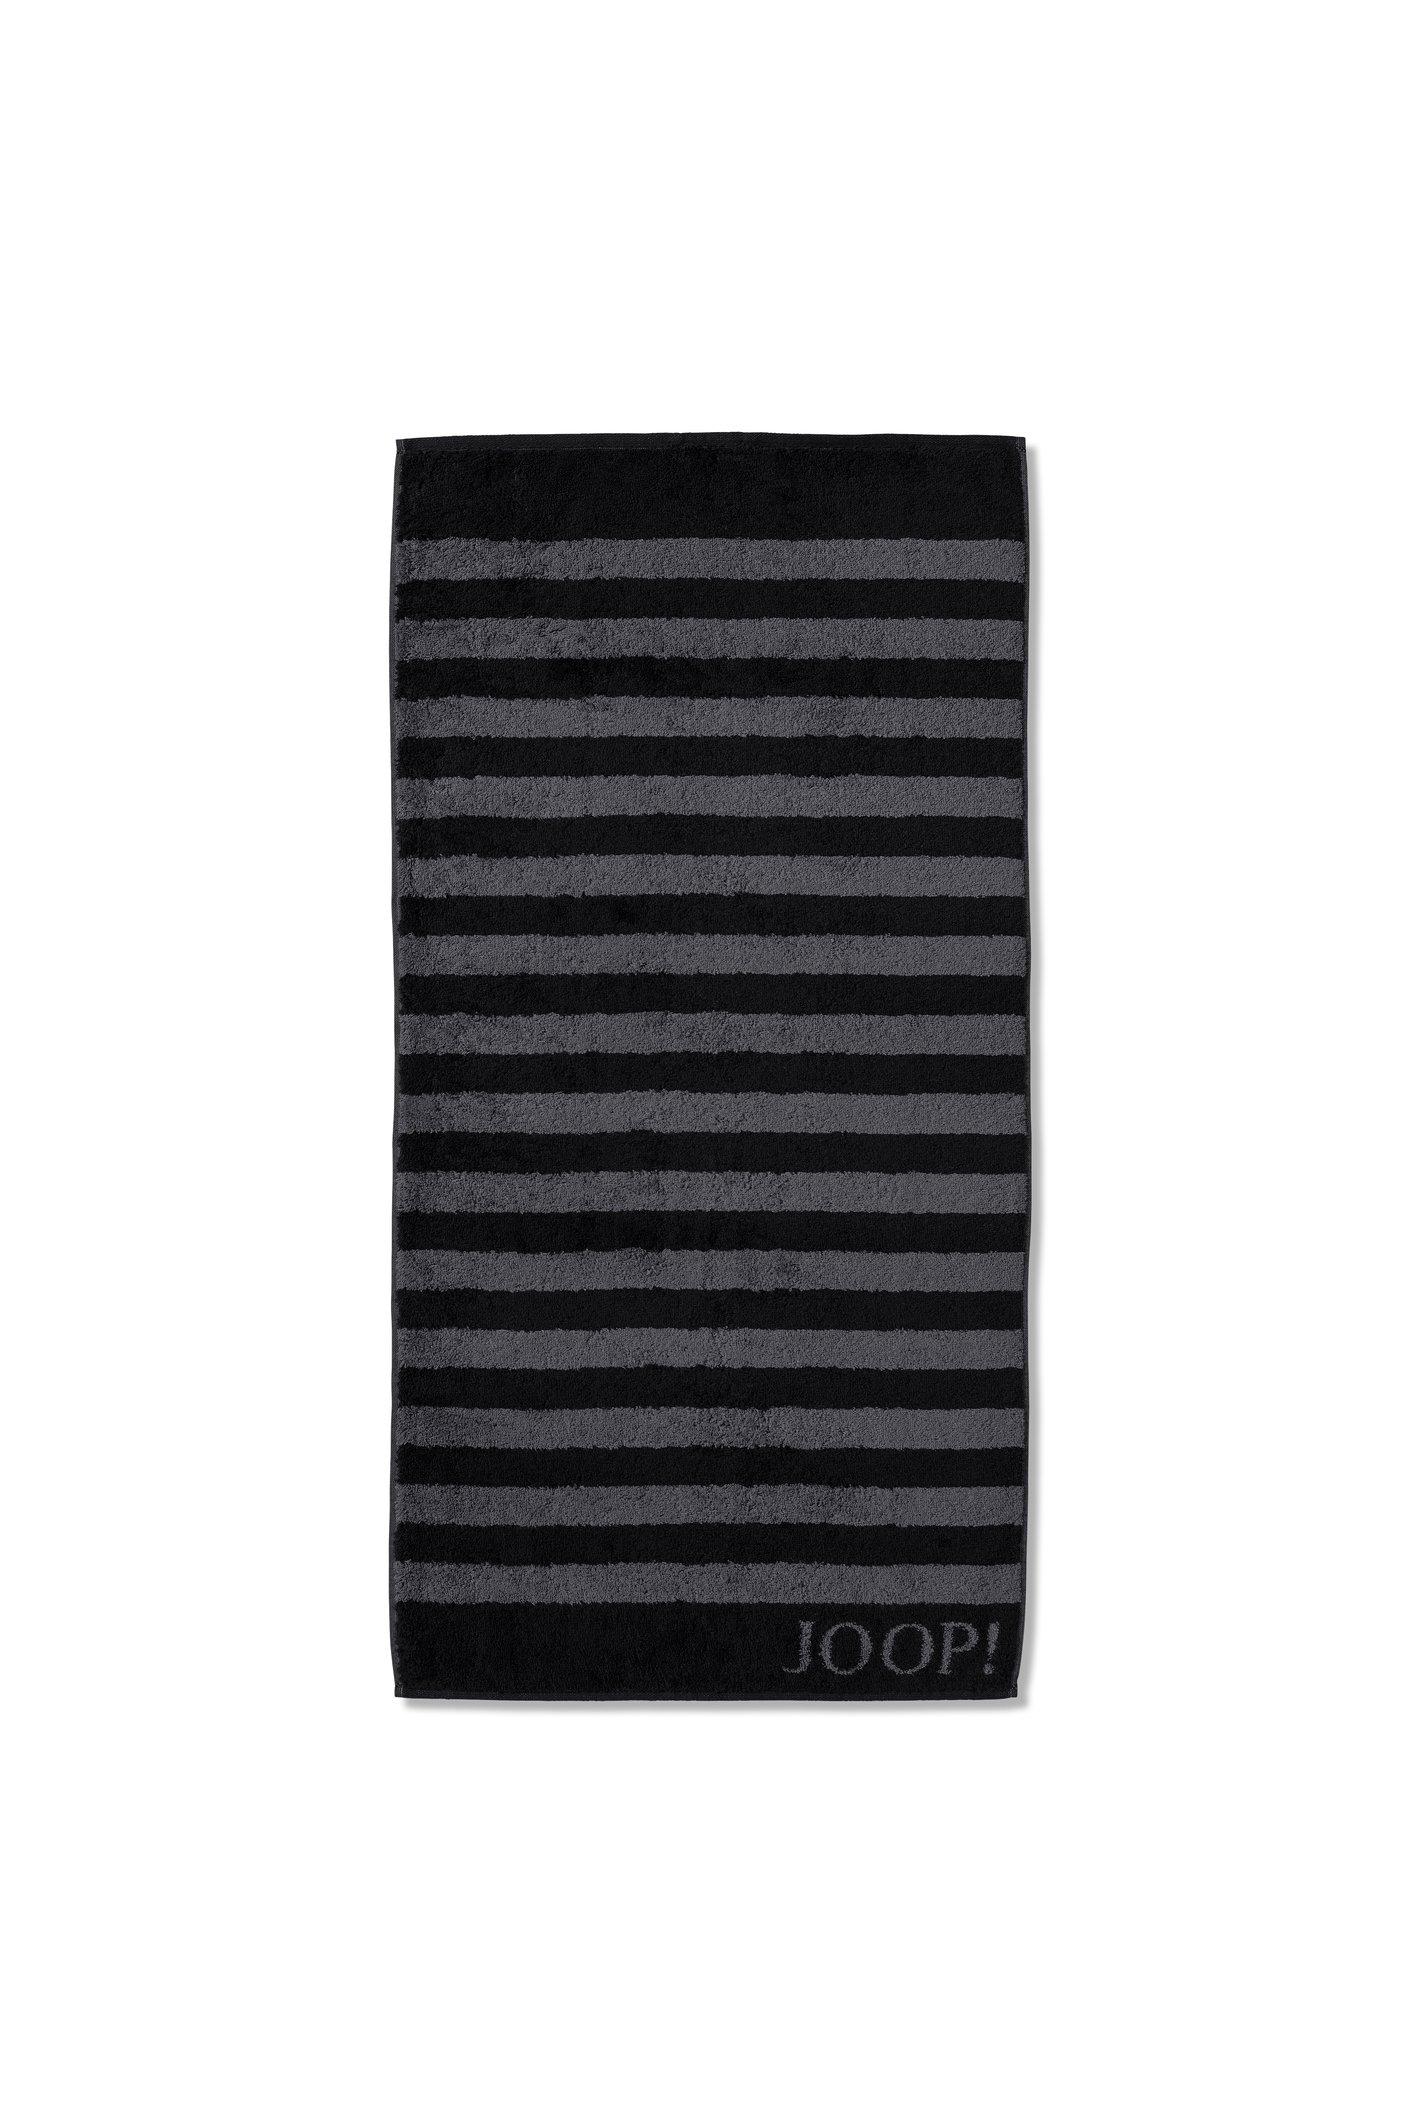 JOOP! Classic Stripes Handtuch 50x100 cm 1610-90 Schwarz Kollektion 2020